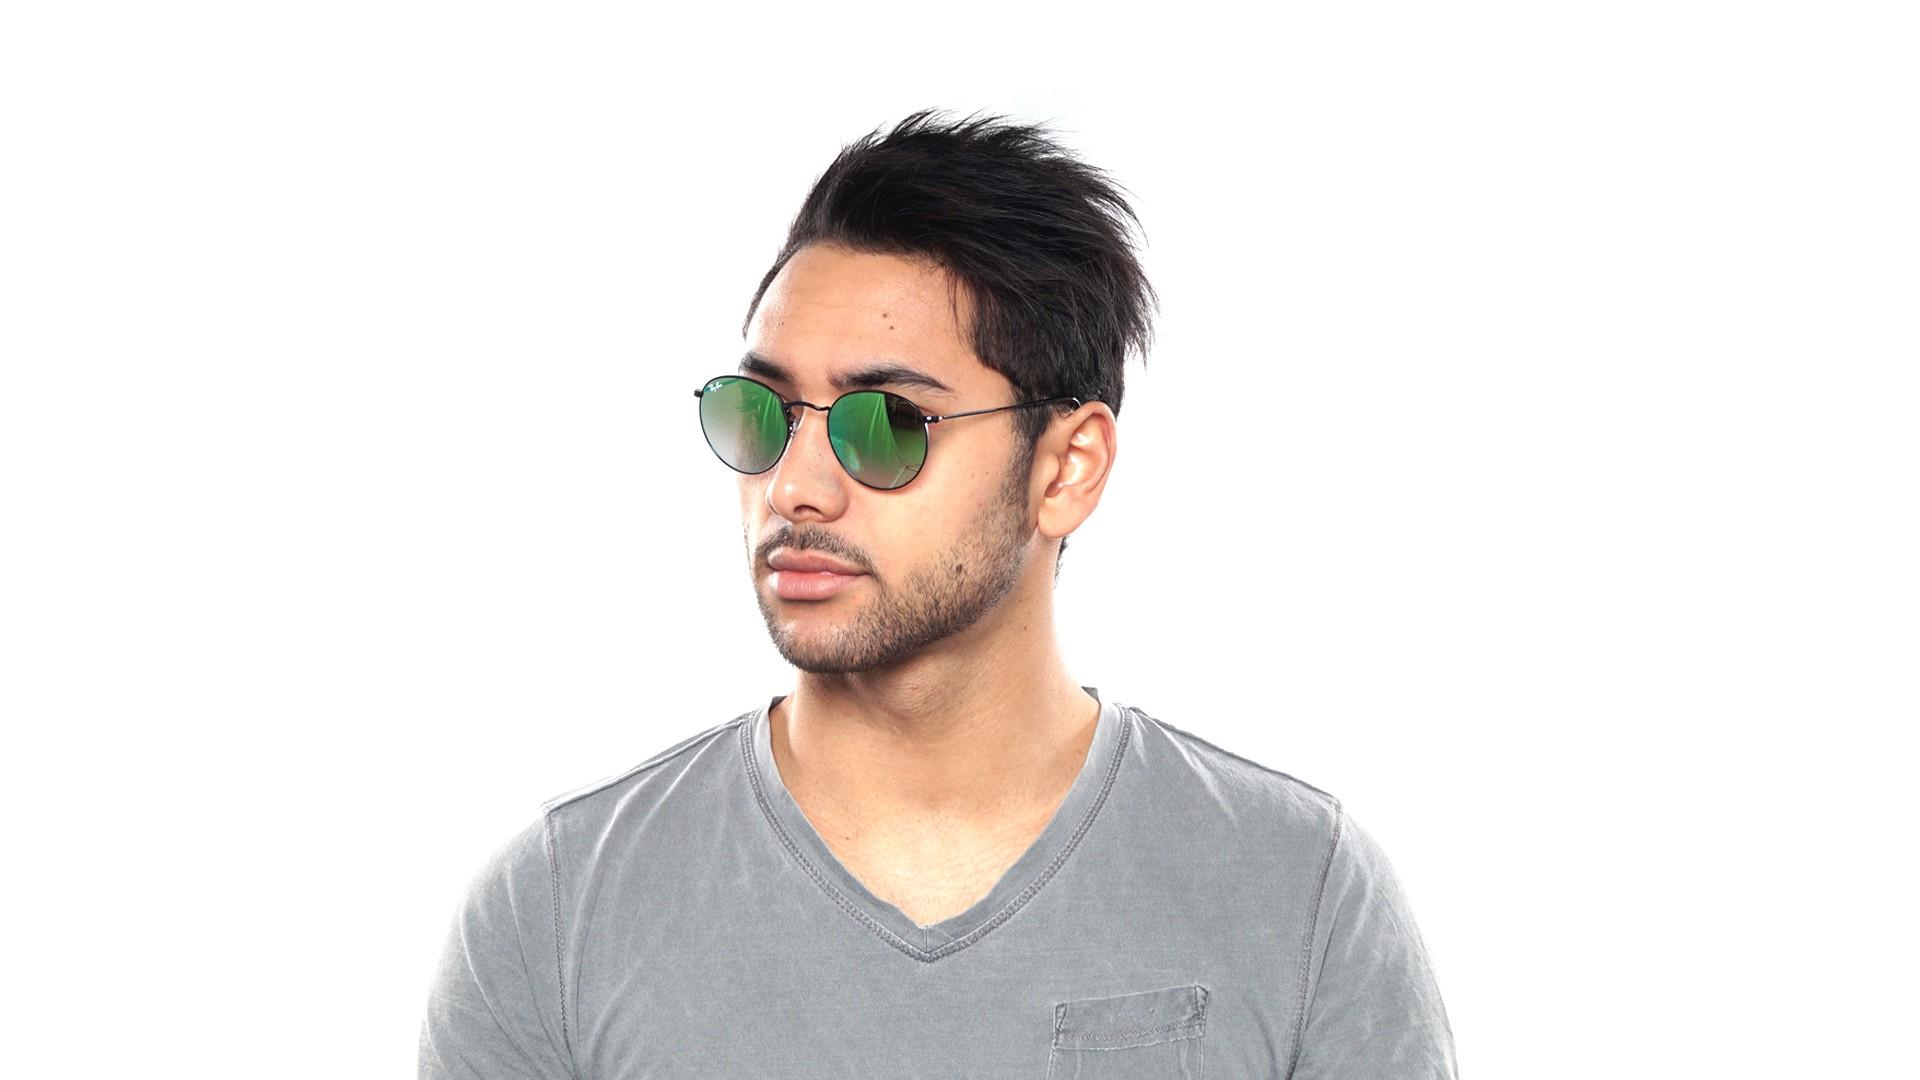 97833af583f325 Sunglasses Ray-Ban Round Metal Black RB3447 002 4J 50-21 Medium Gradient  Mirror